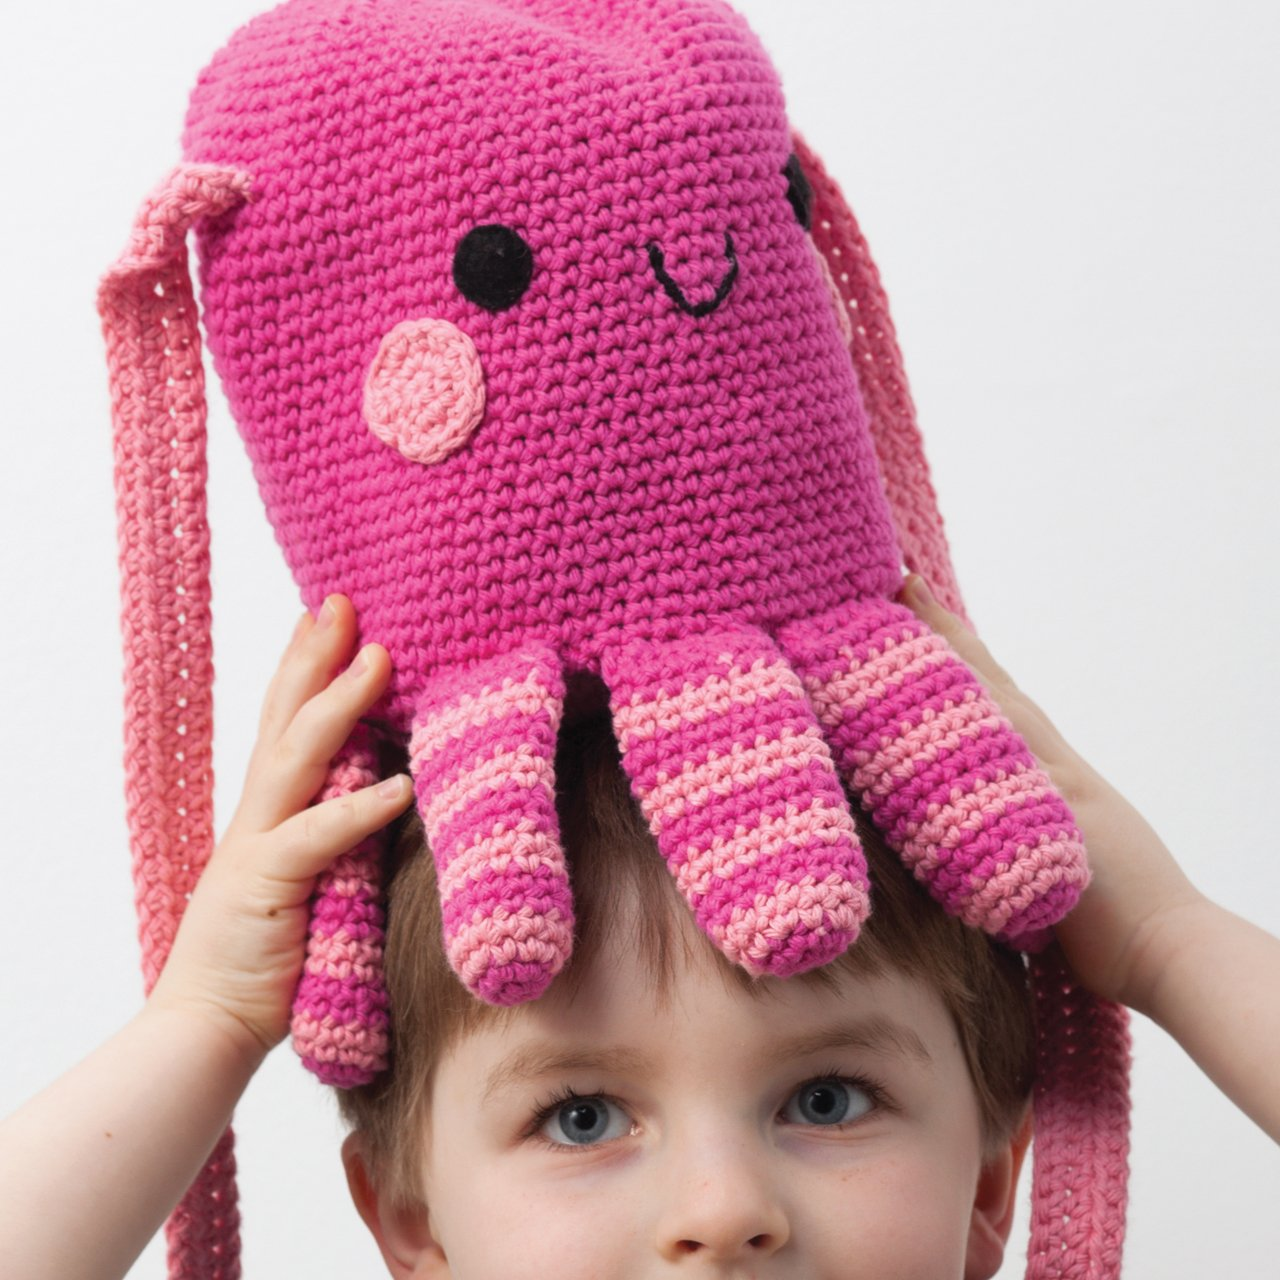 Mercer Market Bag (Free Crochet Pattern) - Sweet Softies | Amigurumi and  Crochet | 1280x1280